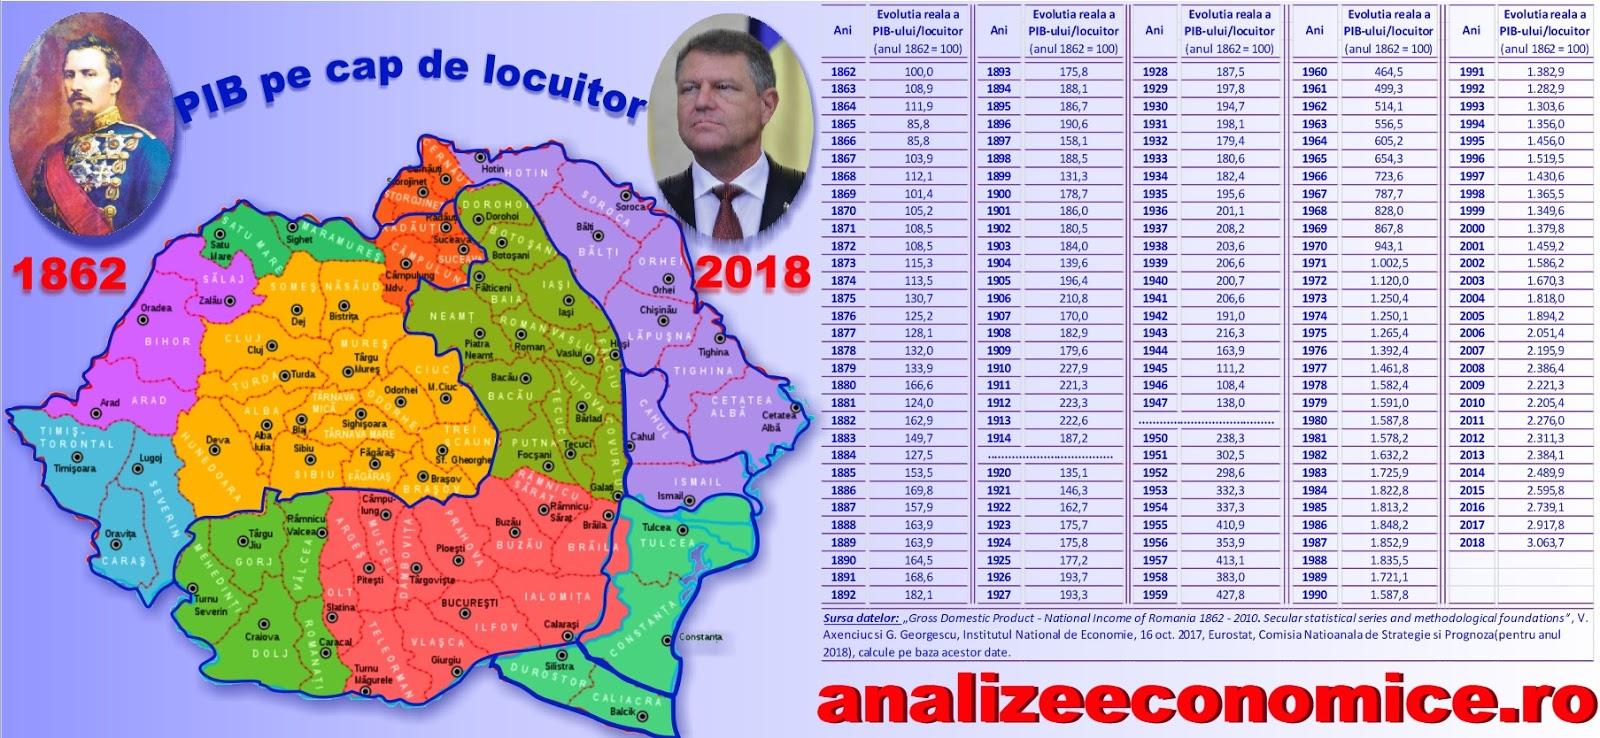 2019 Analize Economice